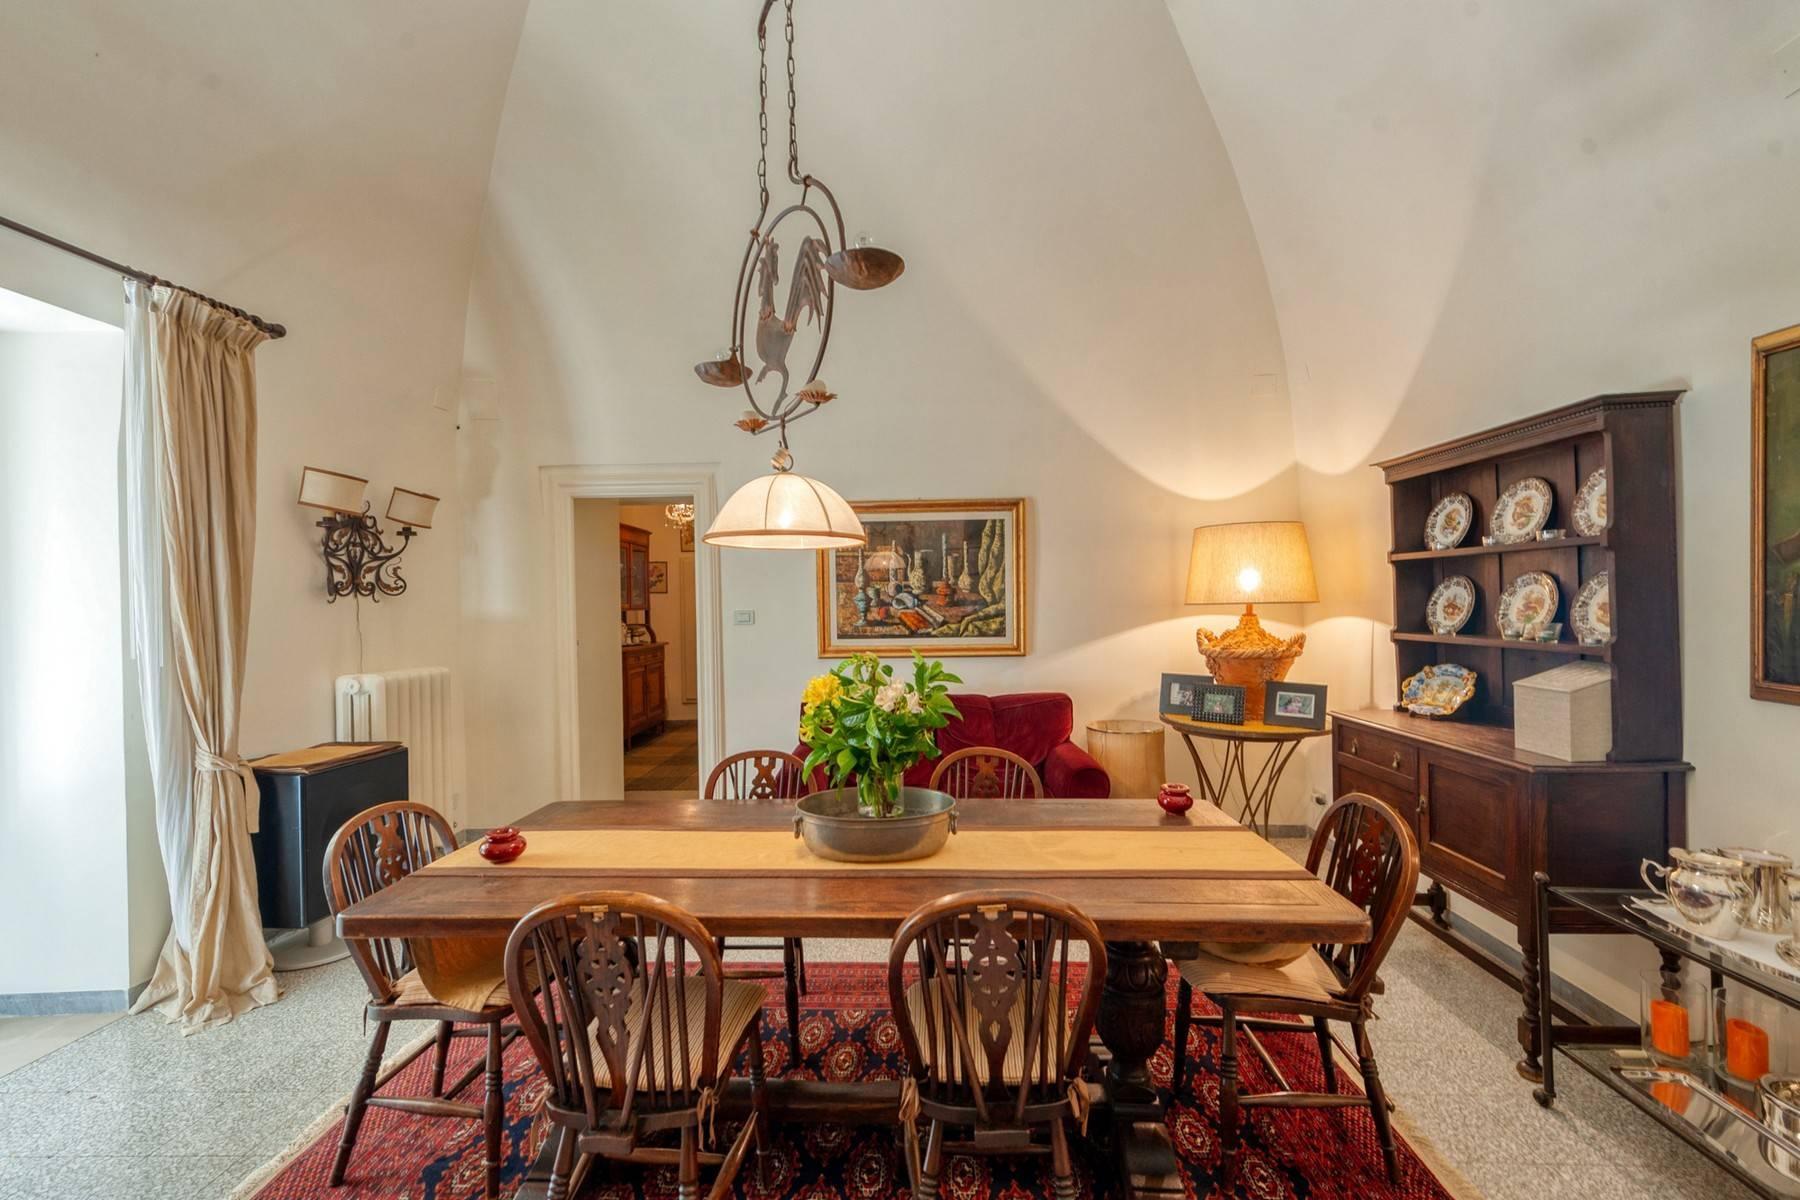 Splendida villa gentilizia del '600 circondata da agrumeti - 12